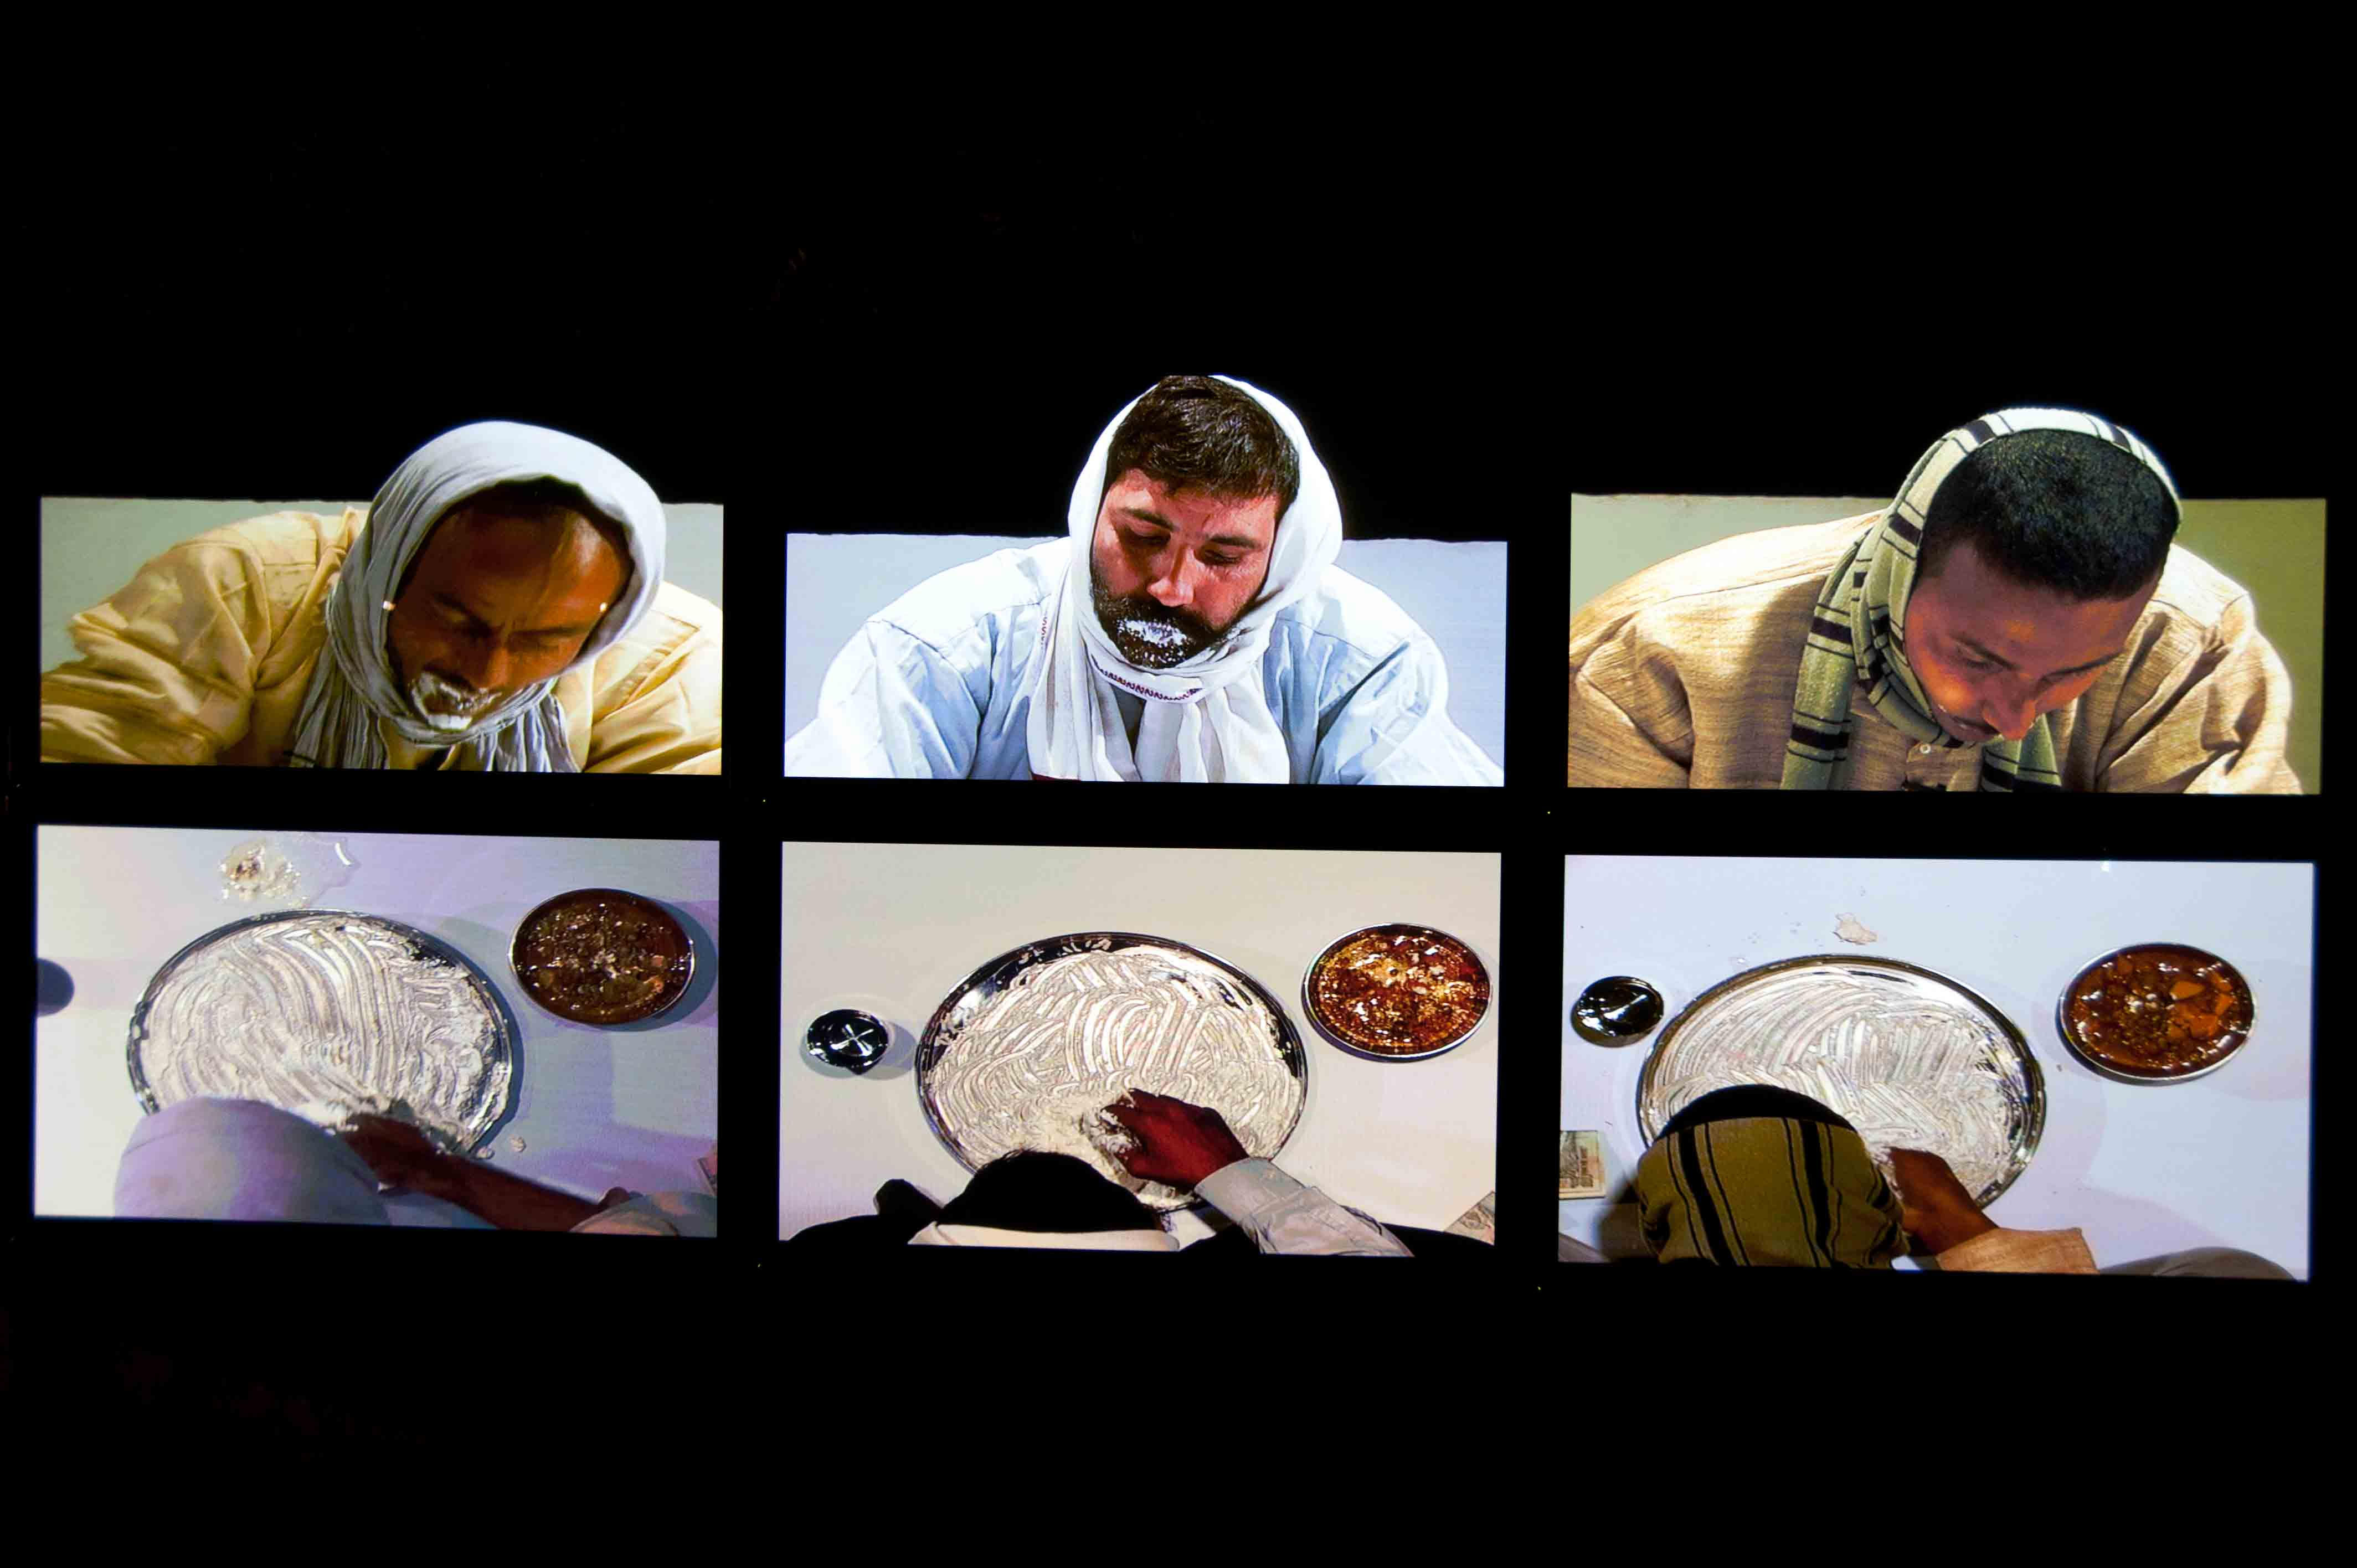 Subodh Gupta Spirit Eaters, 2012 Courtesy of the artist